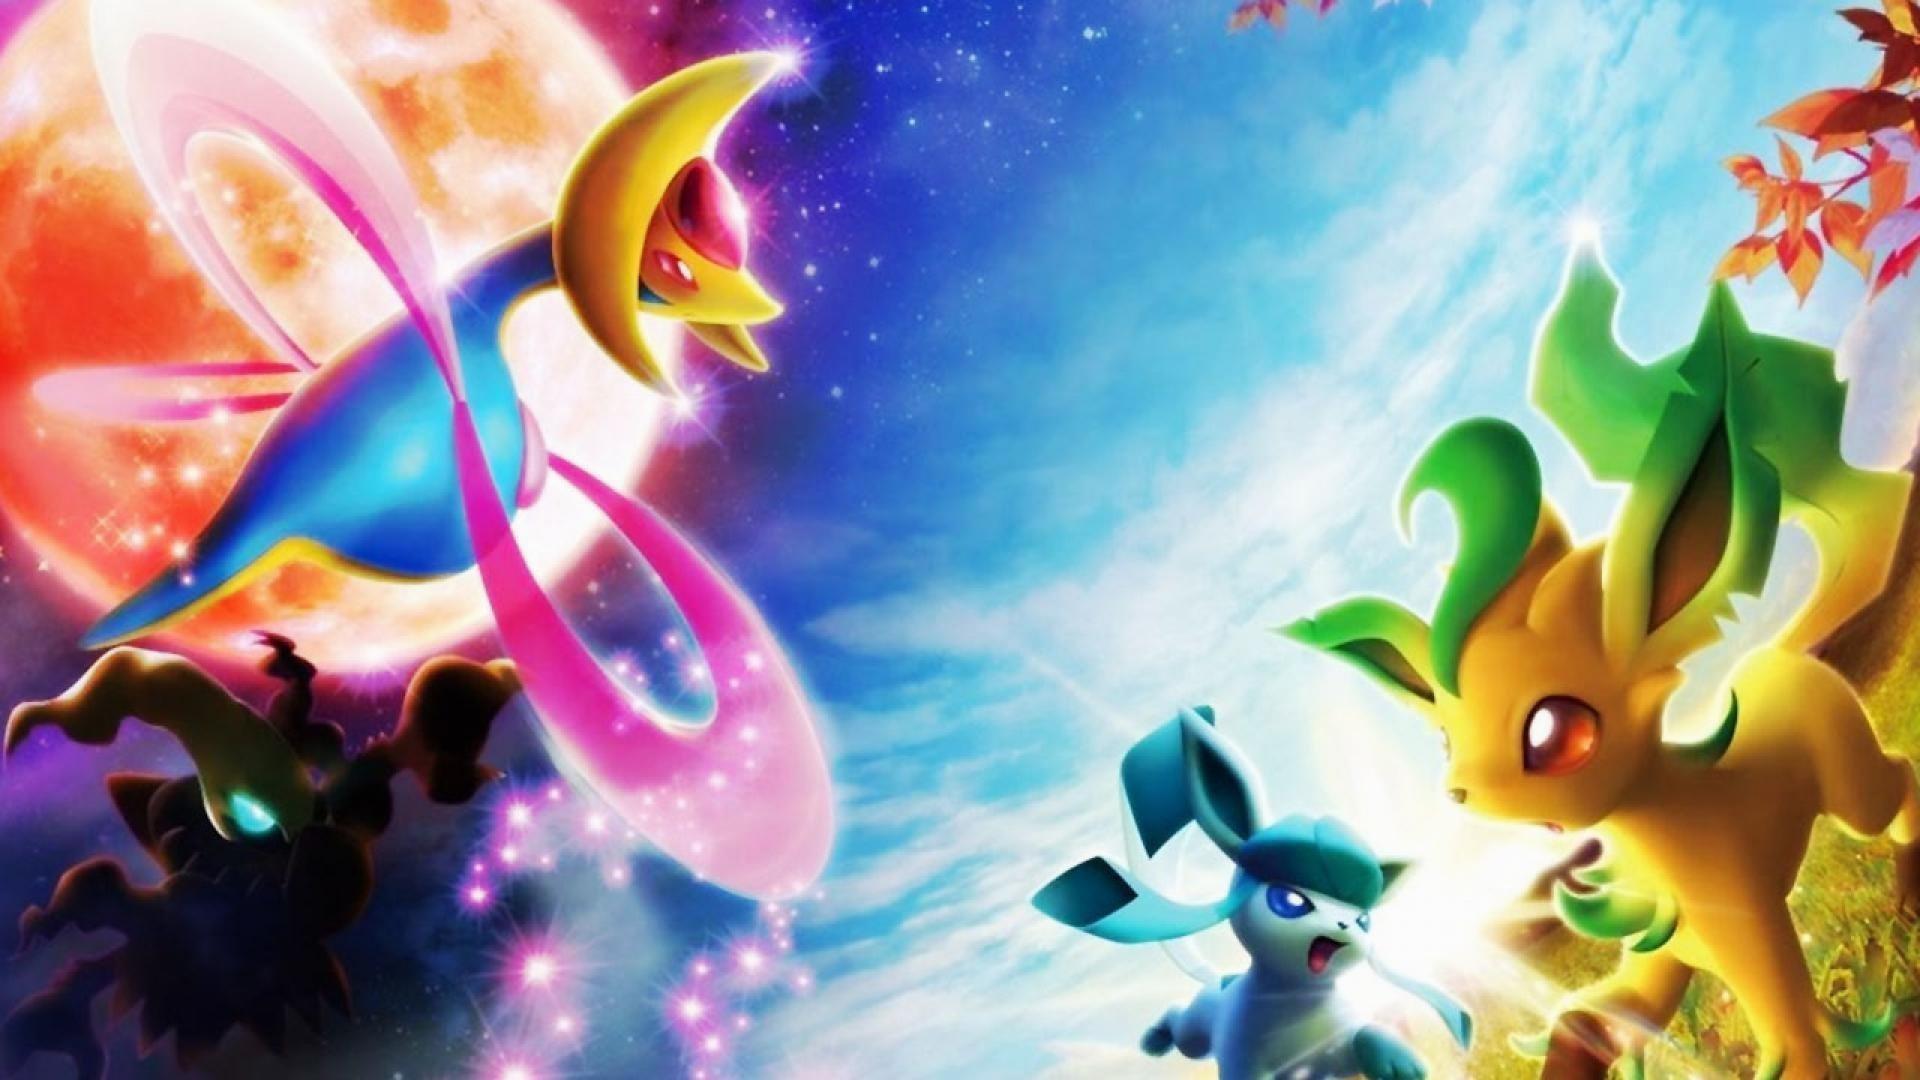 wallpaper.wiki-Pokemon-Phone-Eevee-Backgrounds-PIC-WPE007003